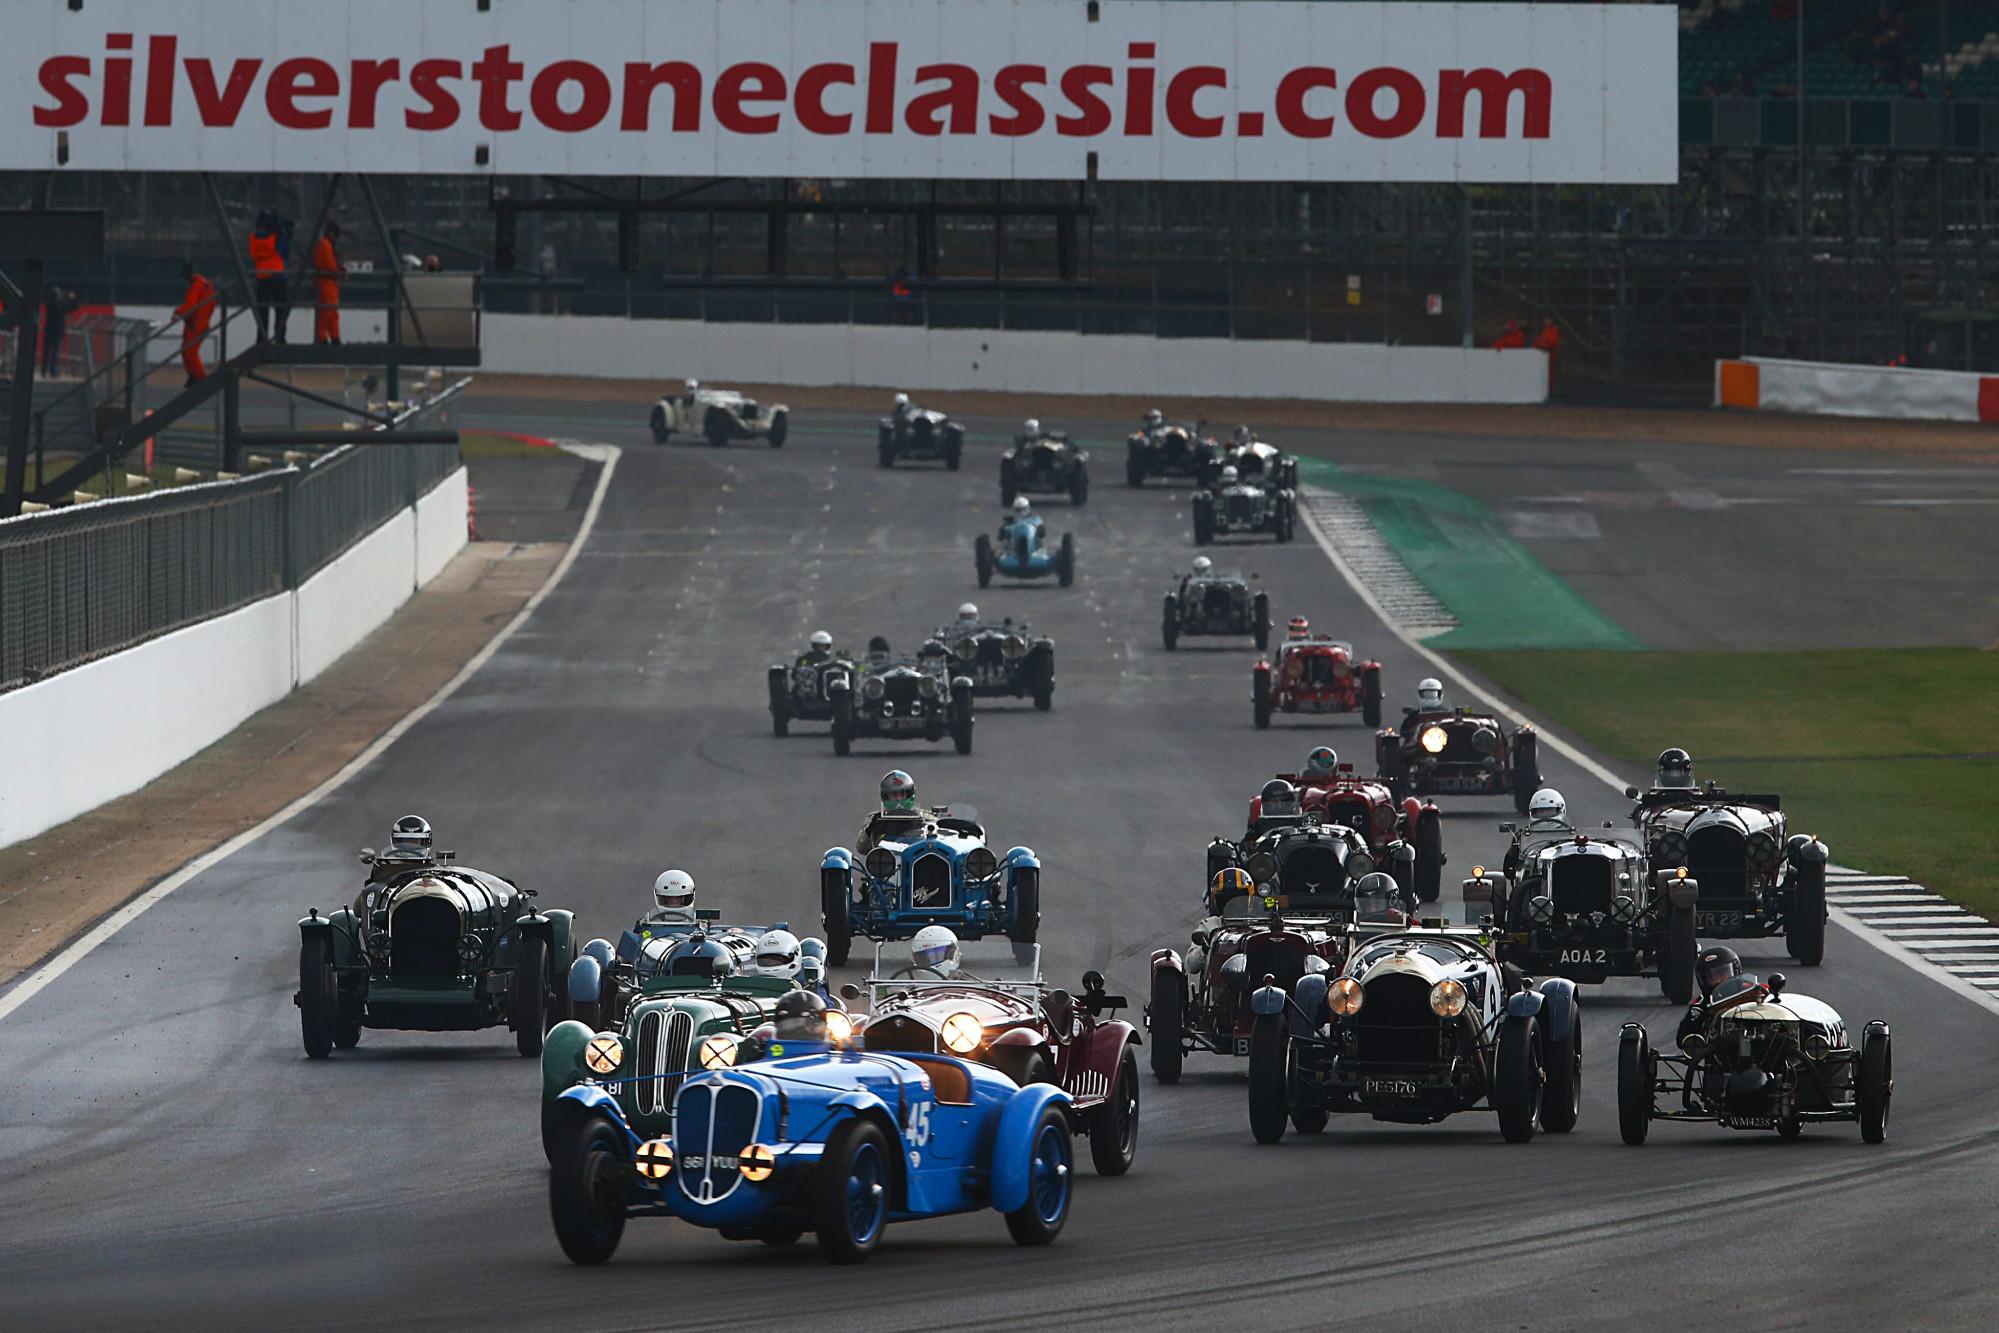 2019 Silverstone Classic Pre-war Bentley's